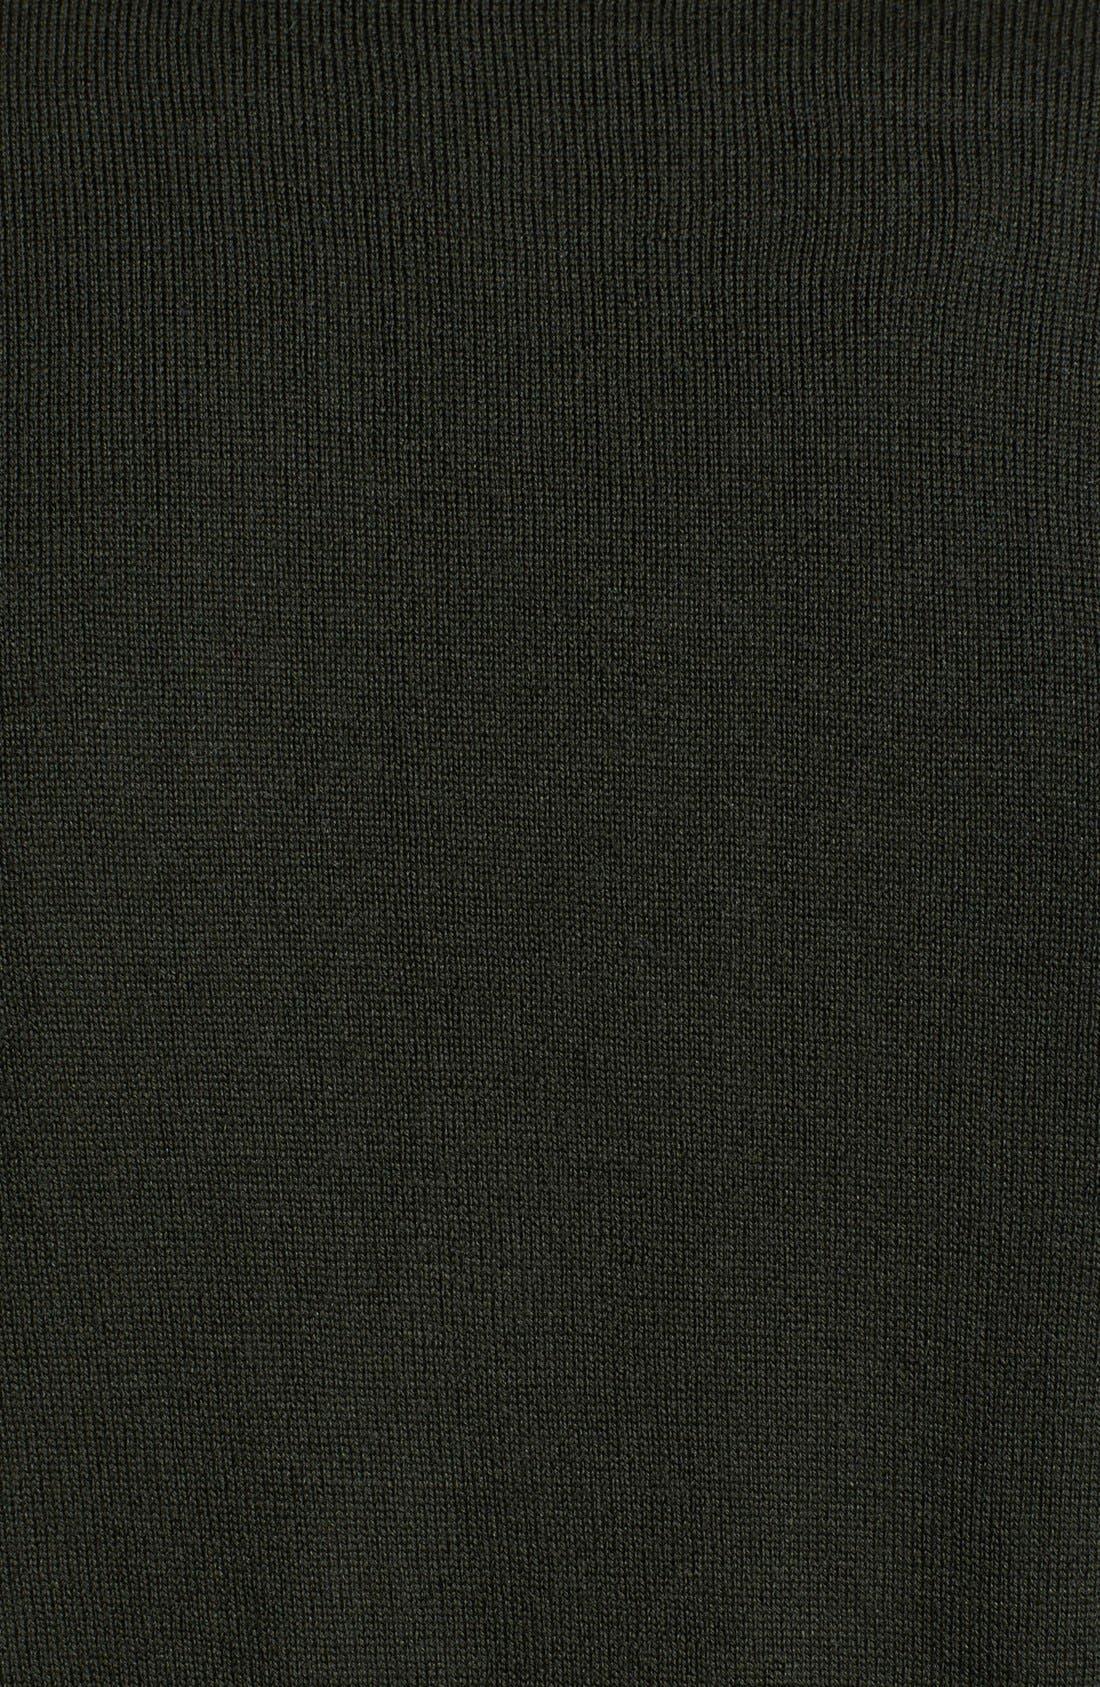 Alternate Image 3  - Etro Colorblock Wool Cardigan